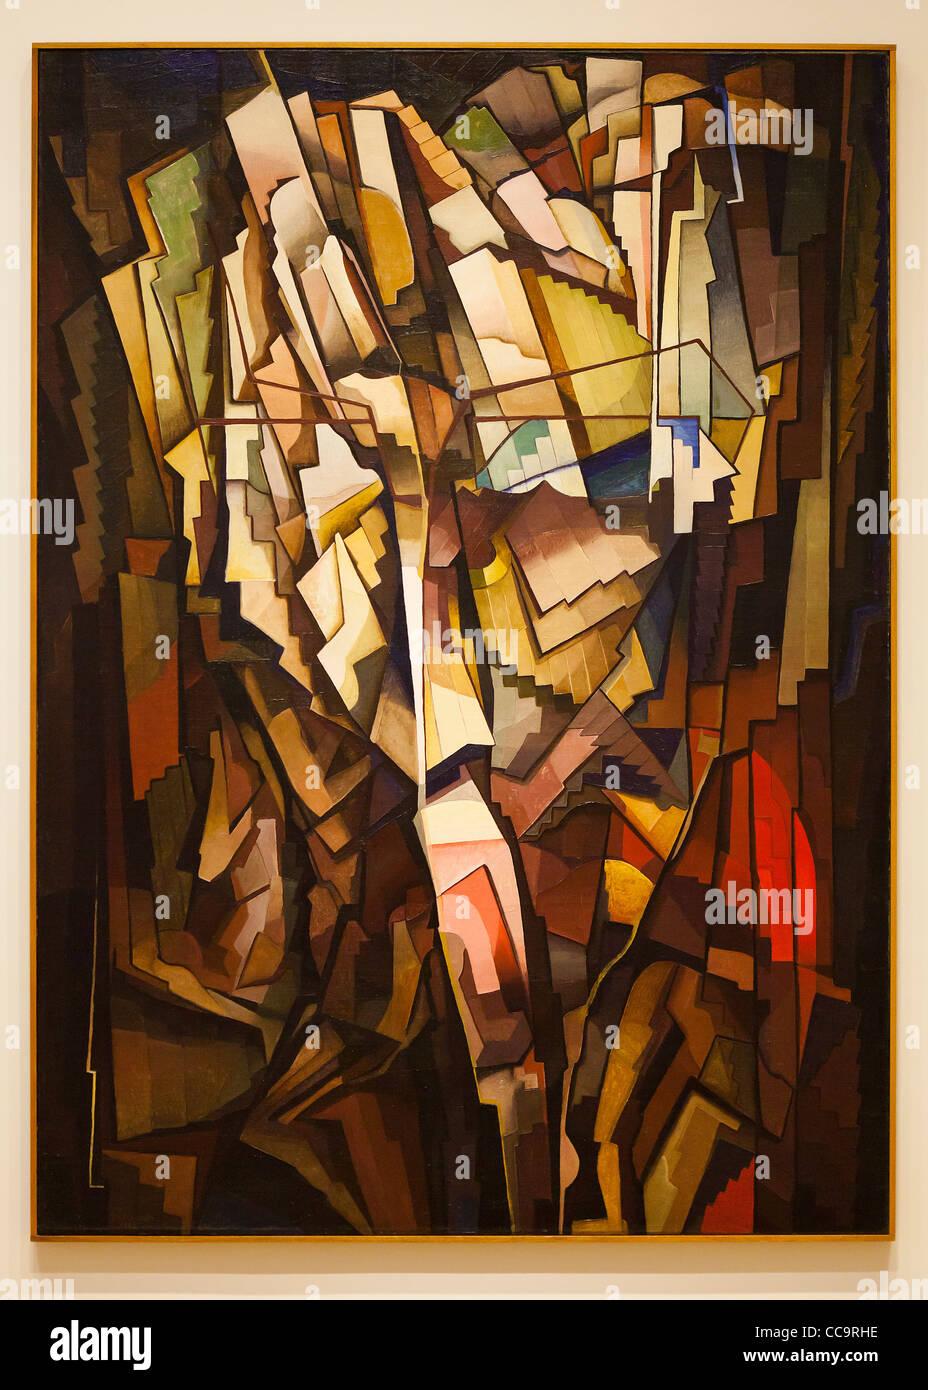 'Synthetic Arrangement' by Morris Kantor c. 1922 - Smithsonian National Gallery of Art, Washington, DC USA - Stock Image